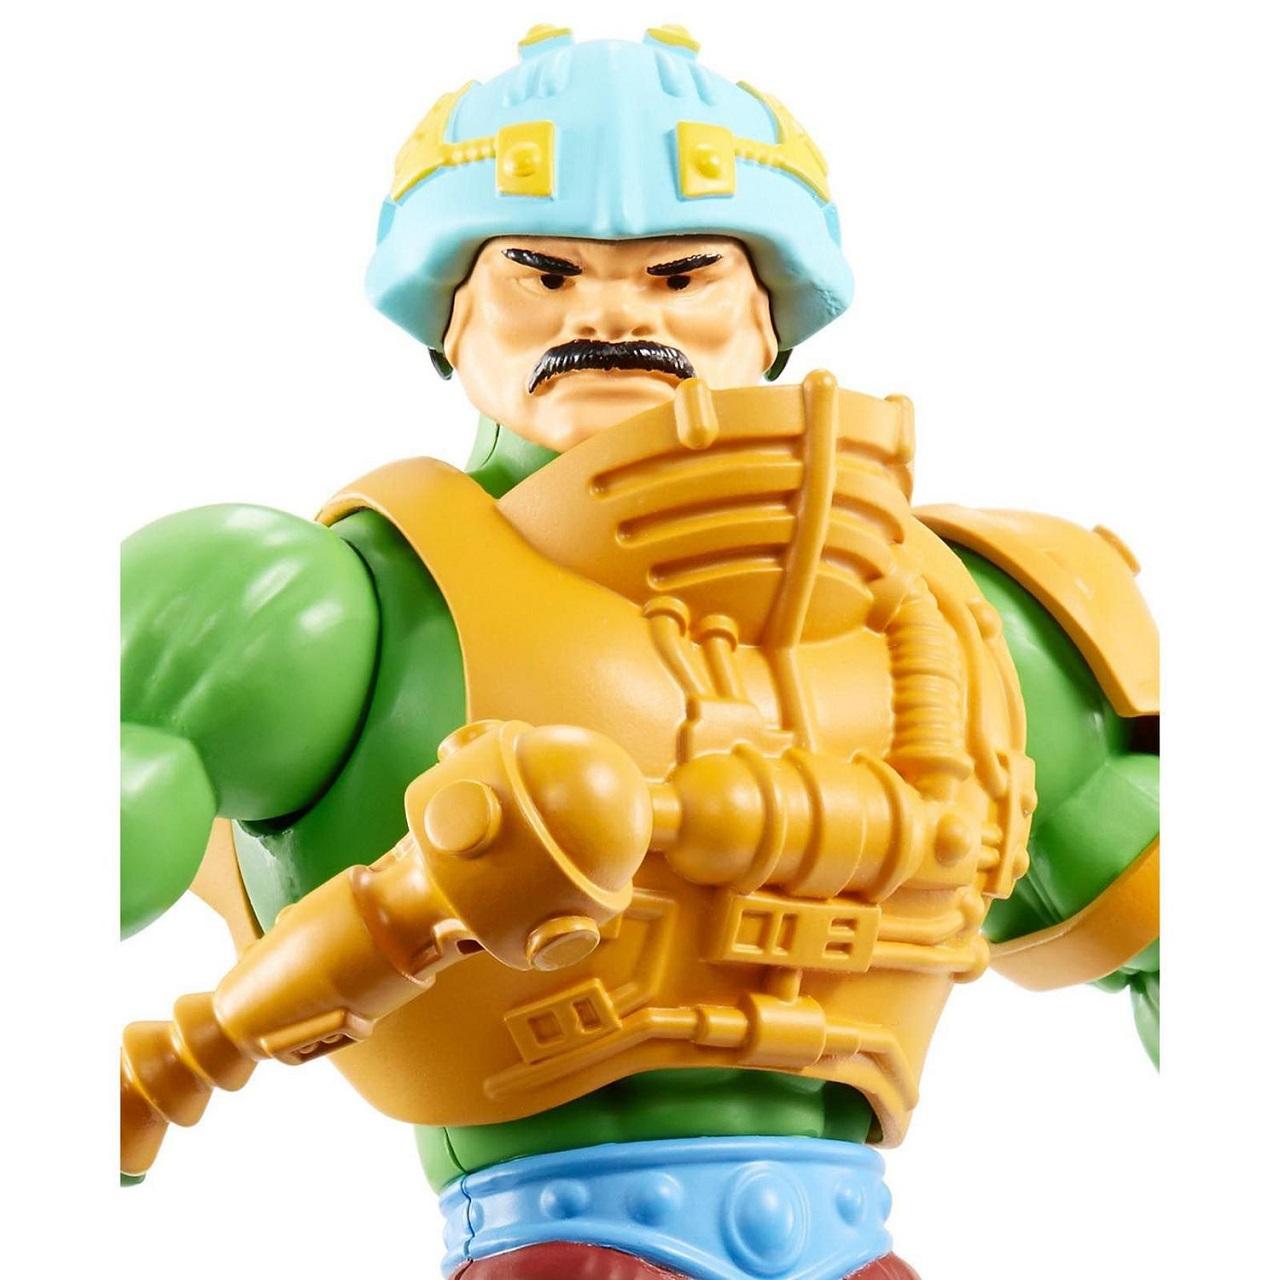 Boneco Mentor 14cm Retrô Motu Masters Of The Universe Mattel